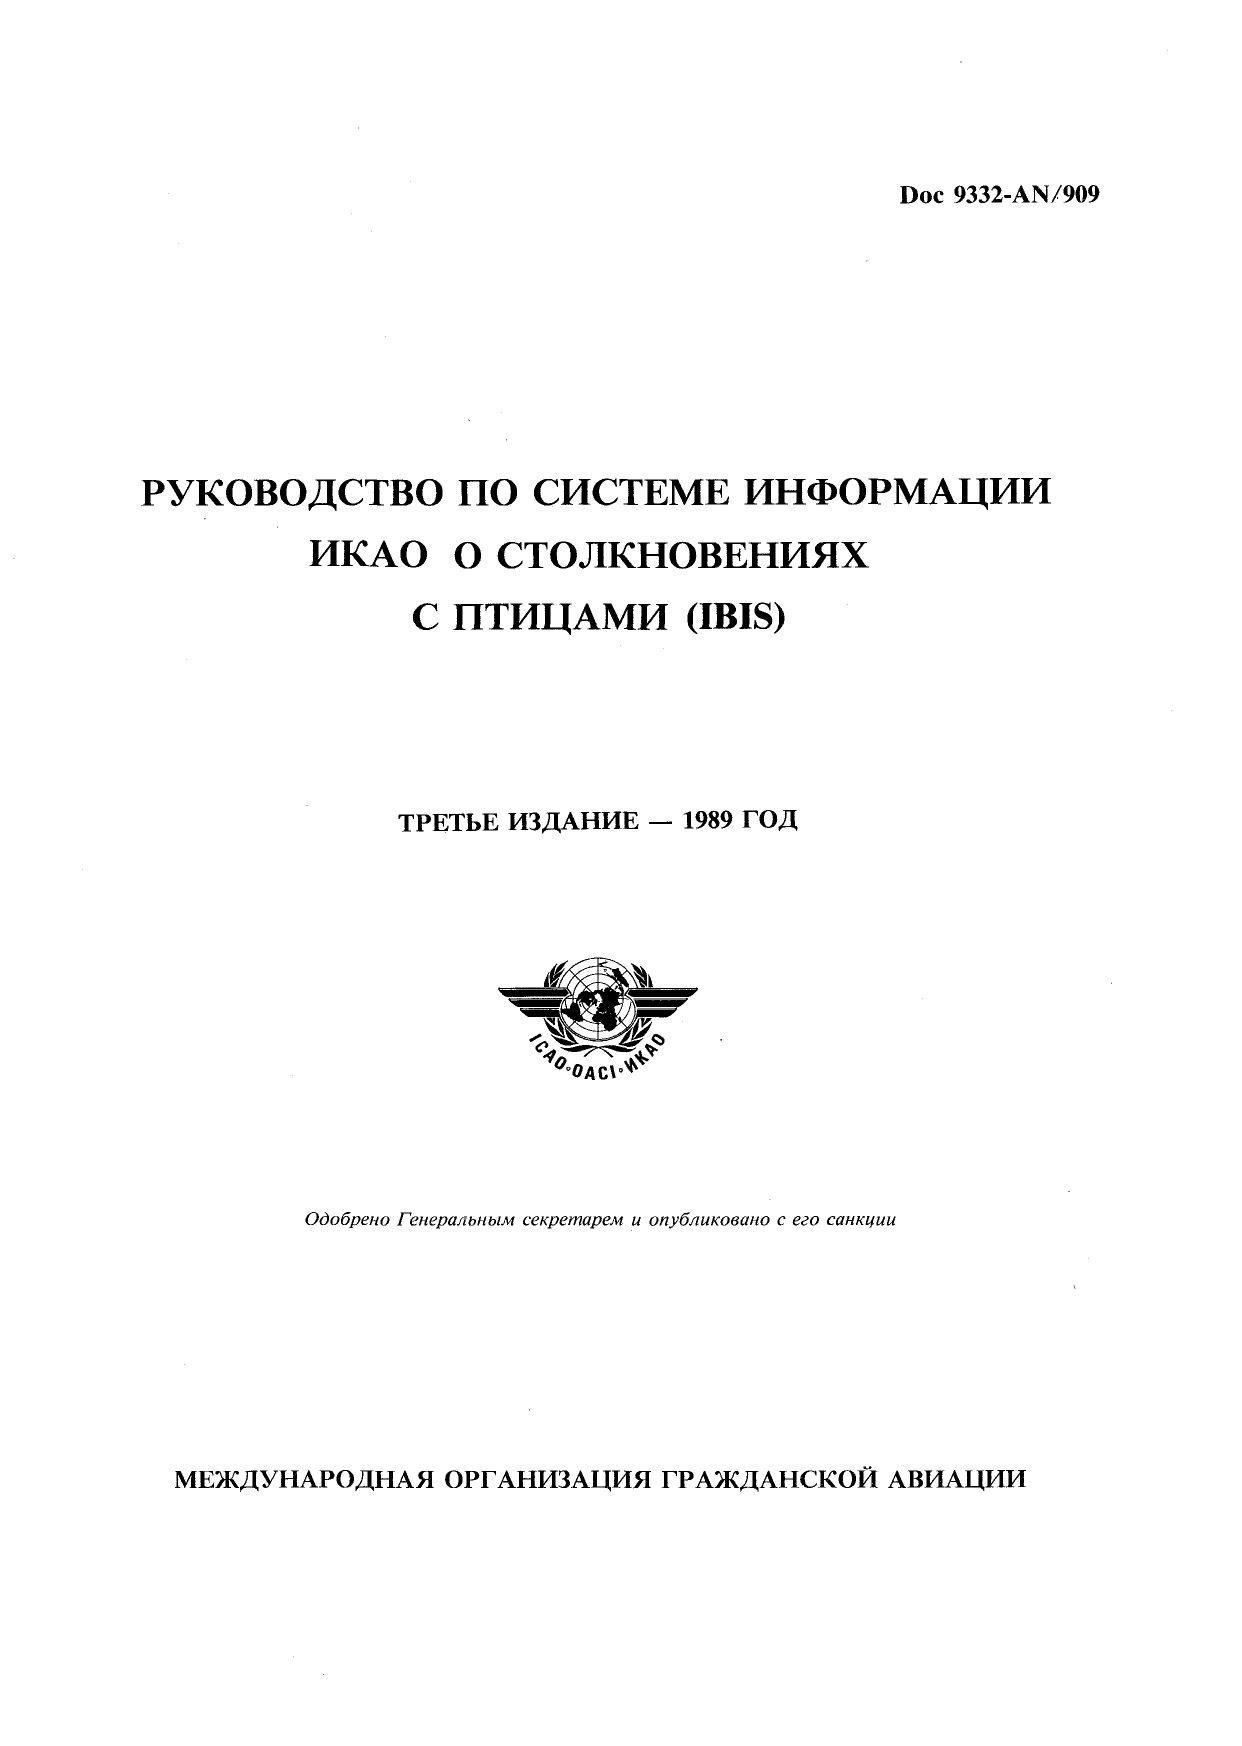 ICAO Doc 9332 Руководство по системе информации ИКАО о столкновении с птицами (IВIS)